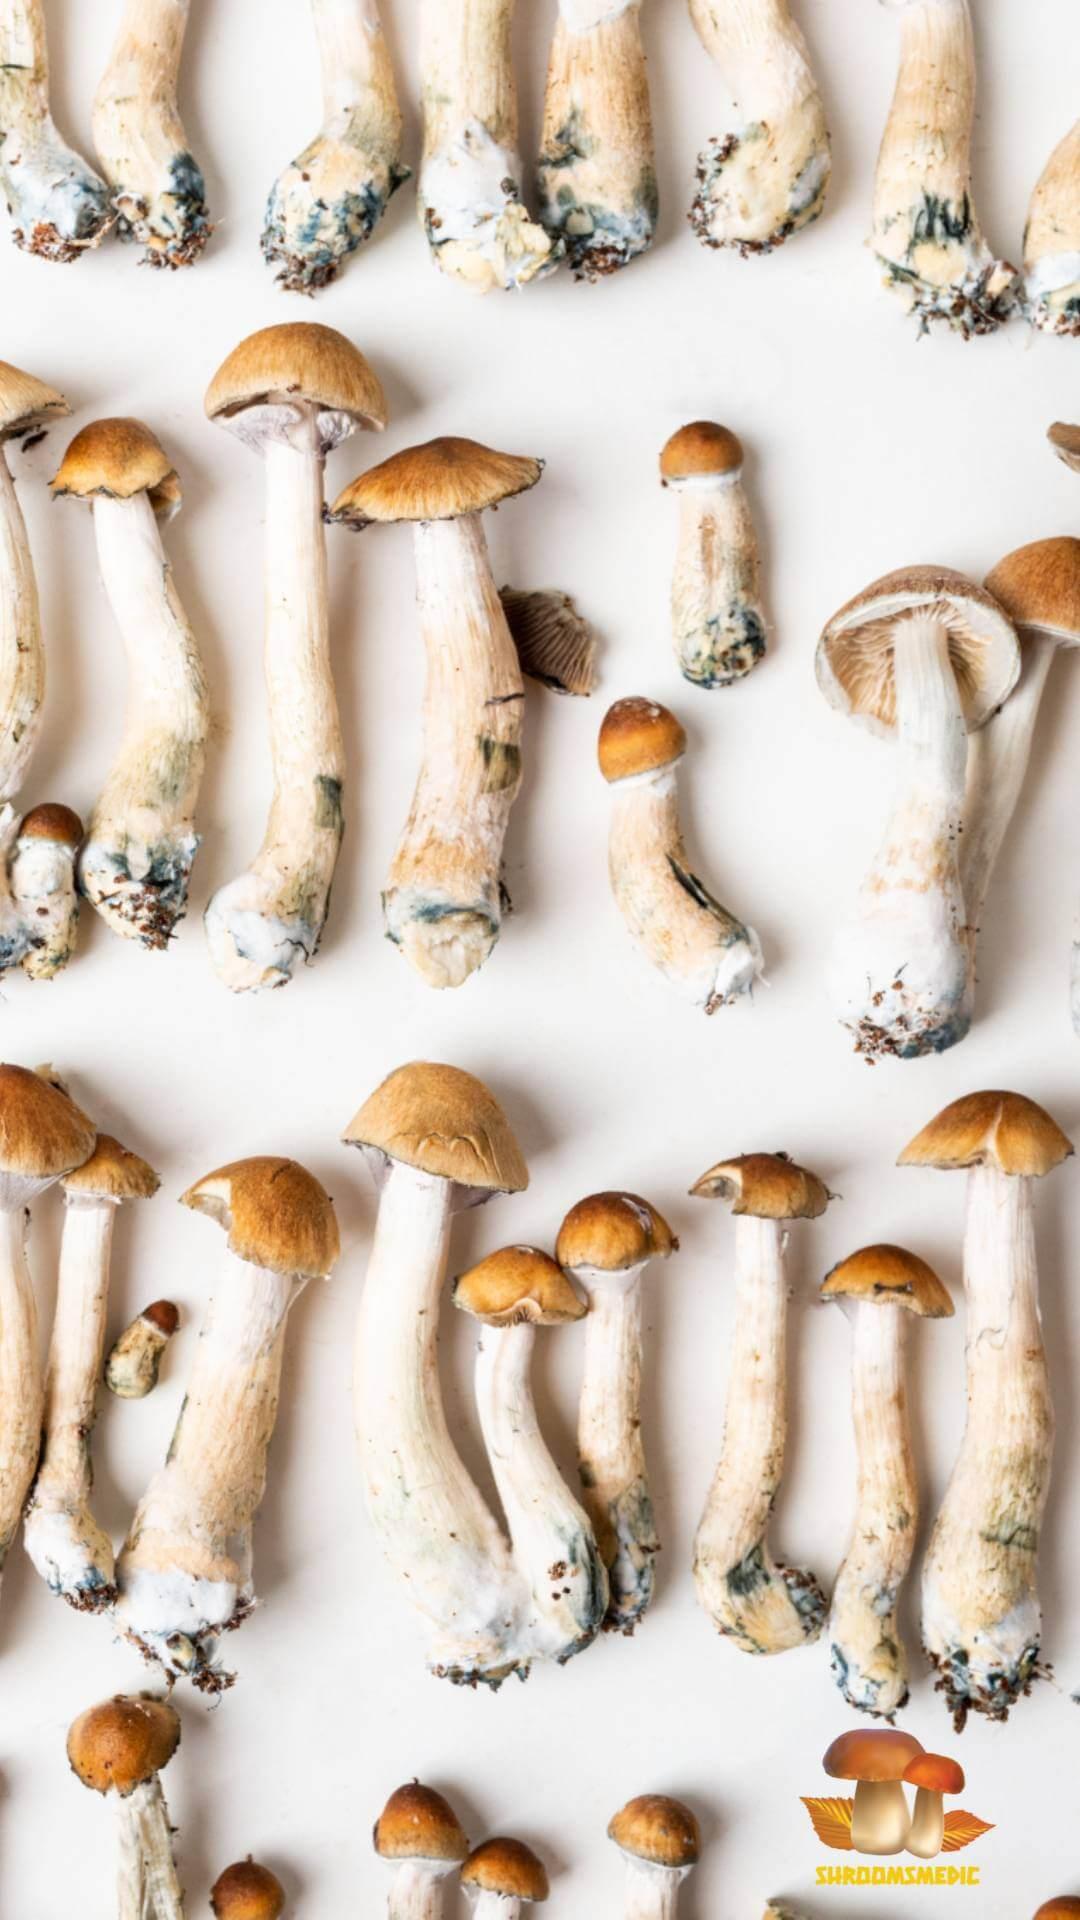 Dried Magic shrooms for sale at mushroom medication